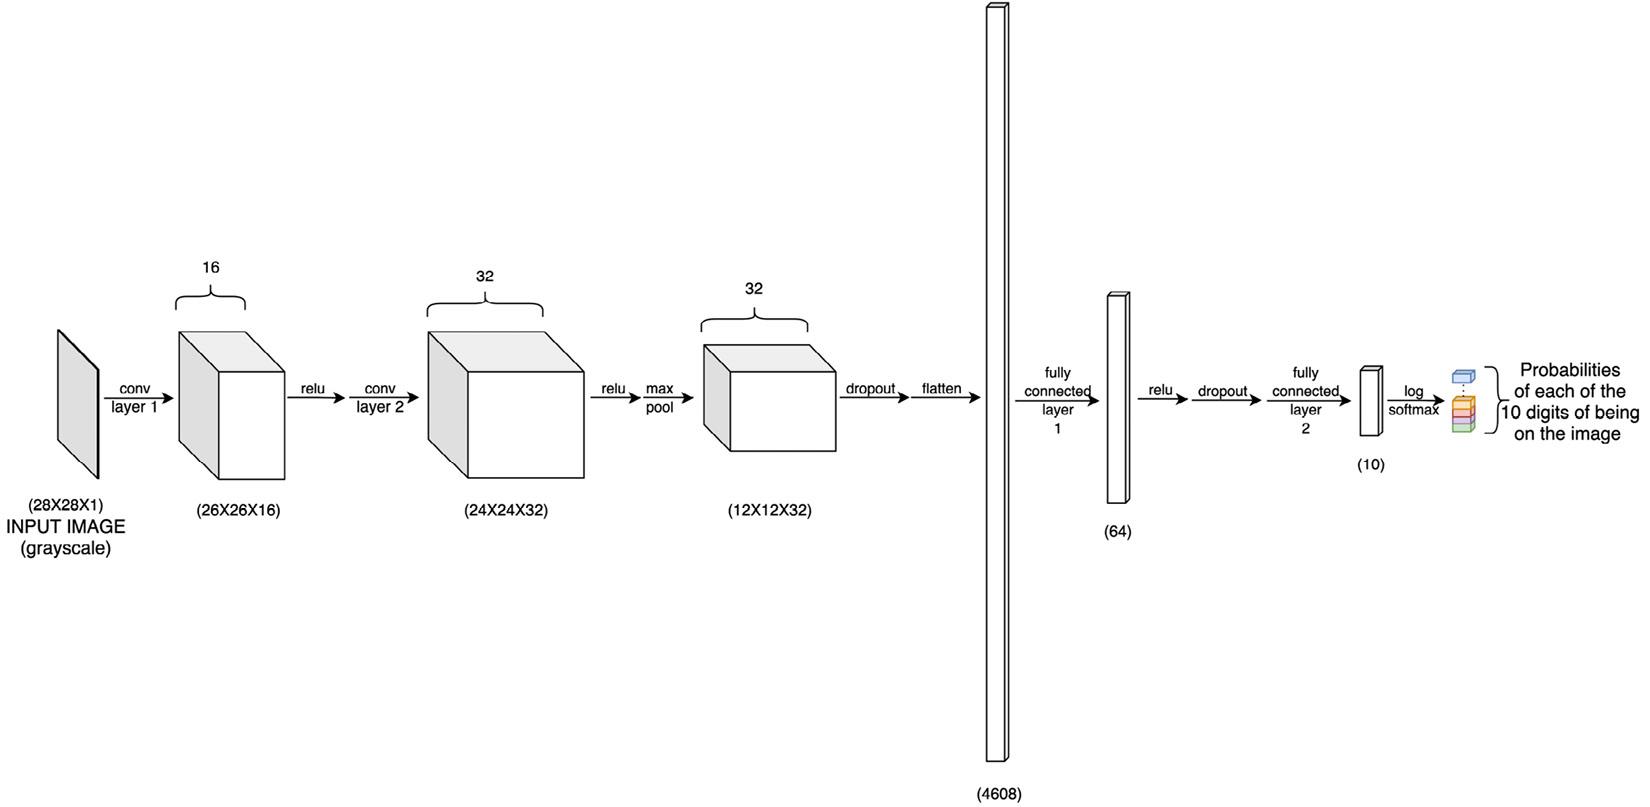 Figure 1.19 – Neural network architecture